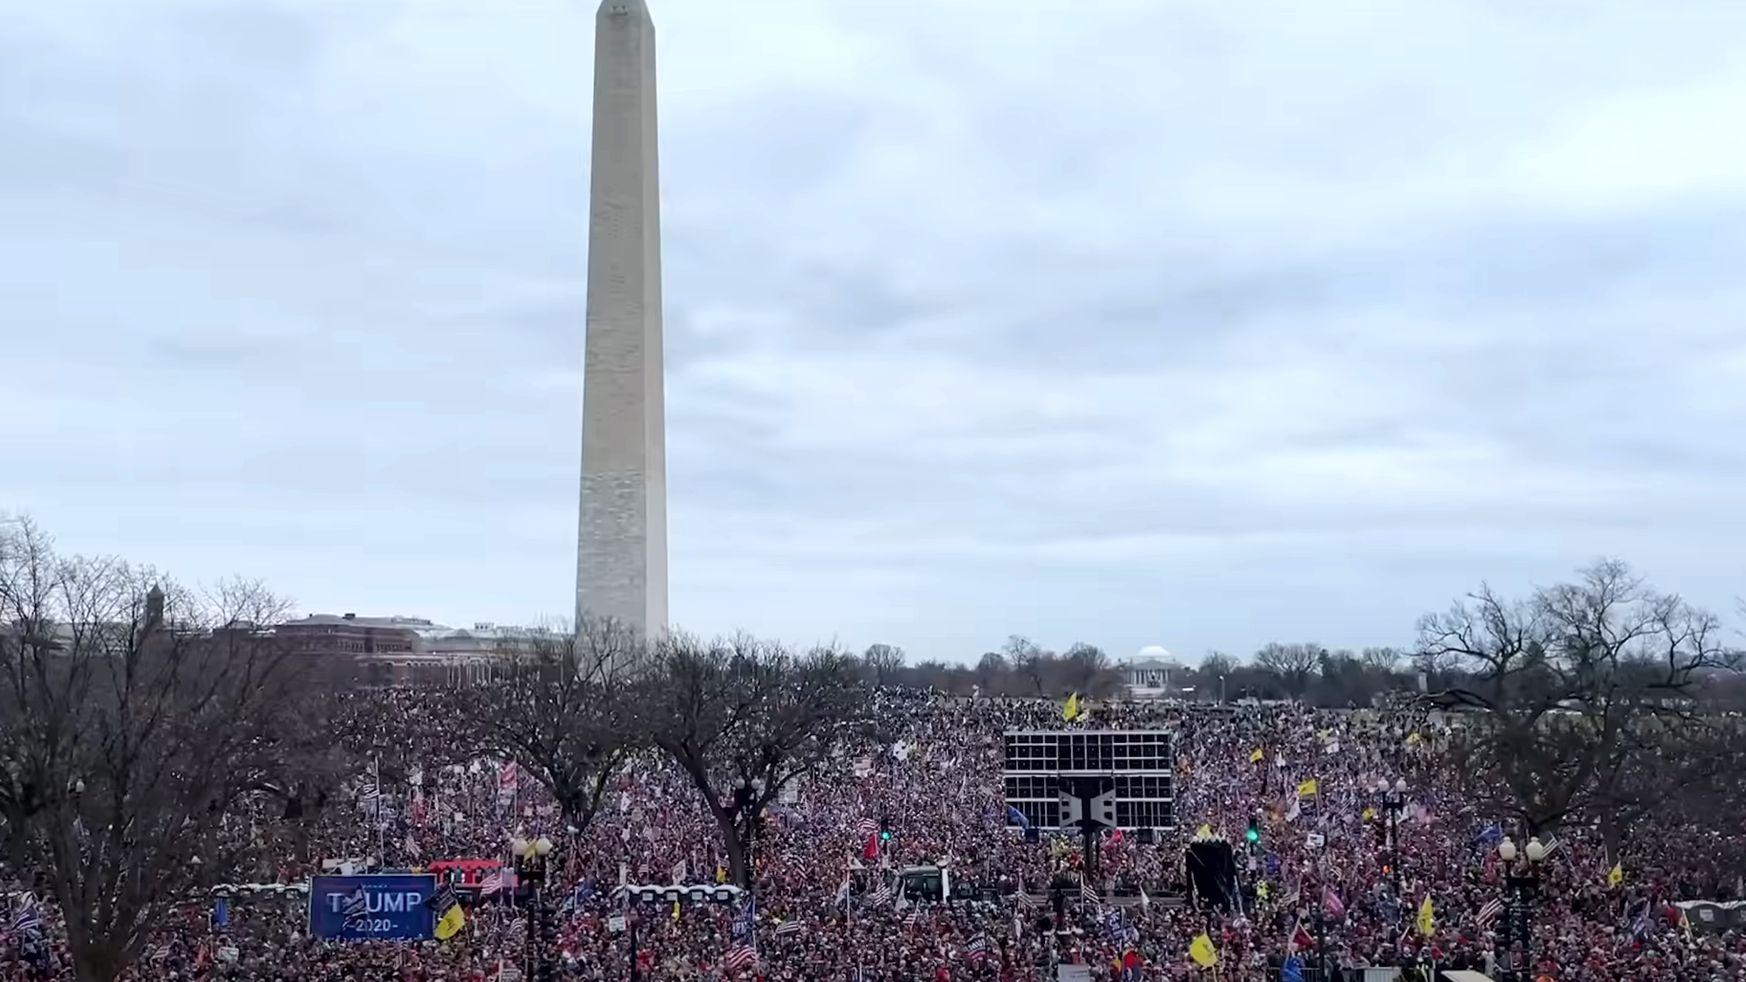 Save America March Crowds Jan 6th